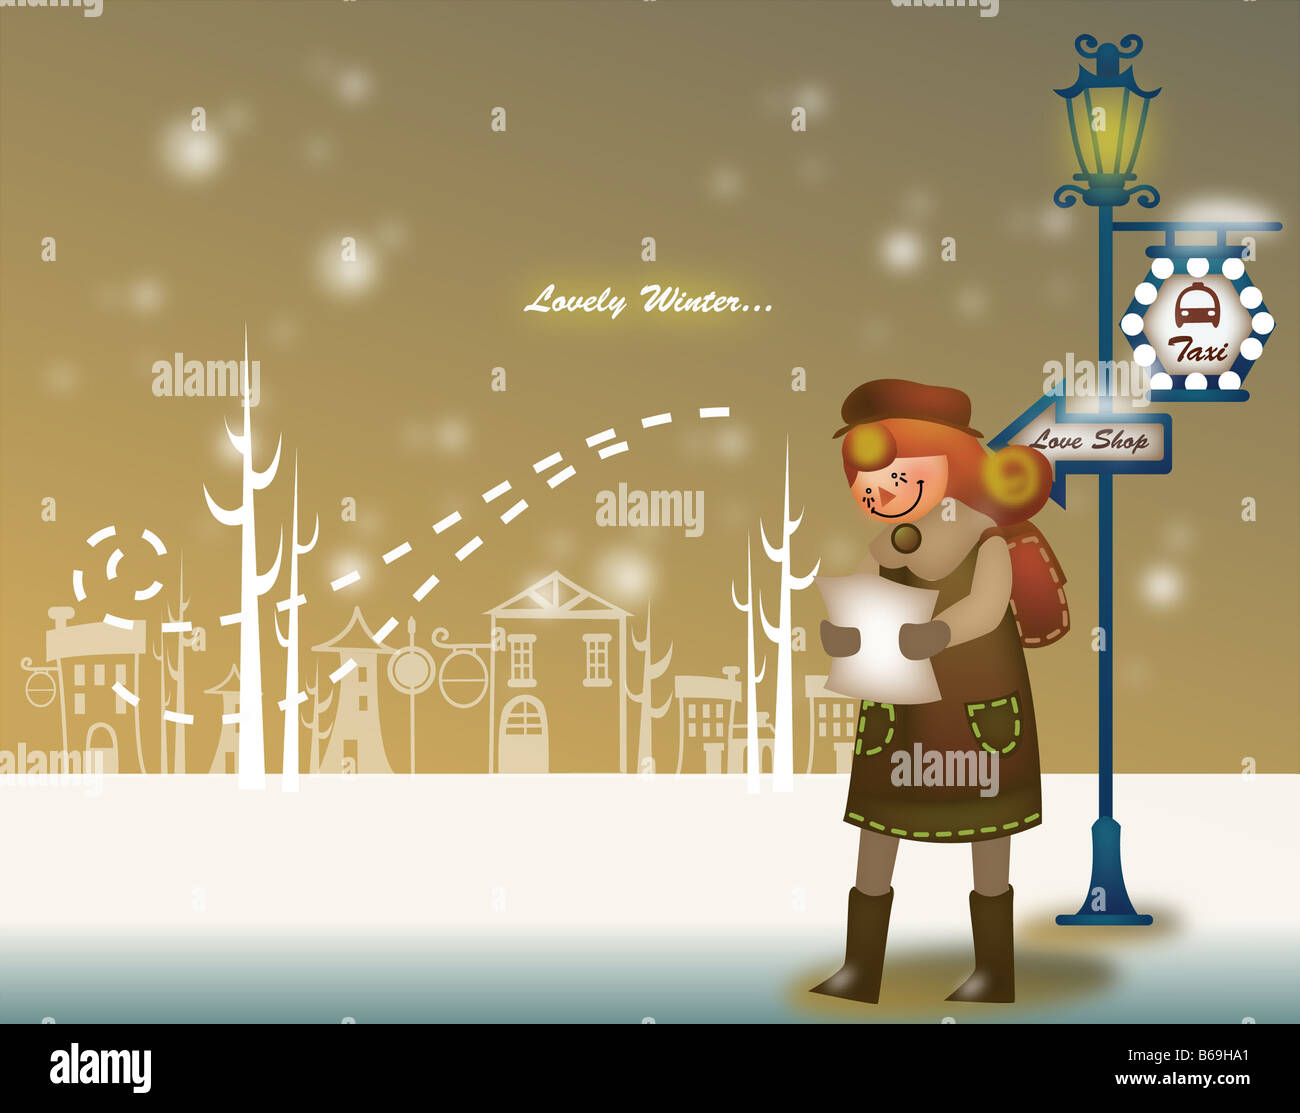 Paisaje de invierno Imagen De Stock